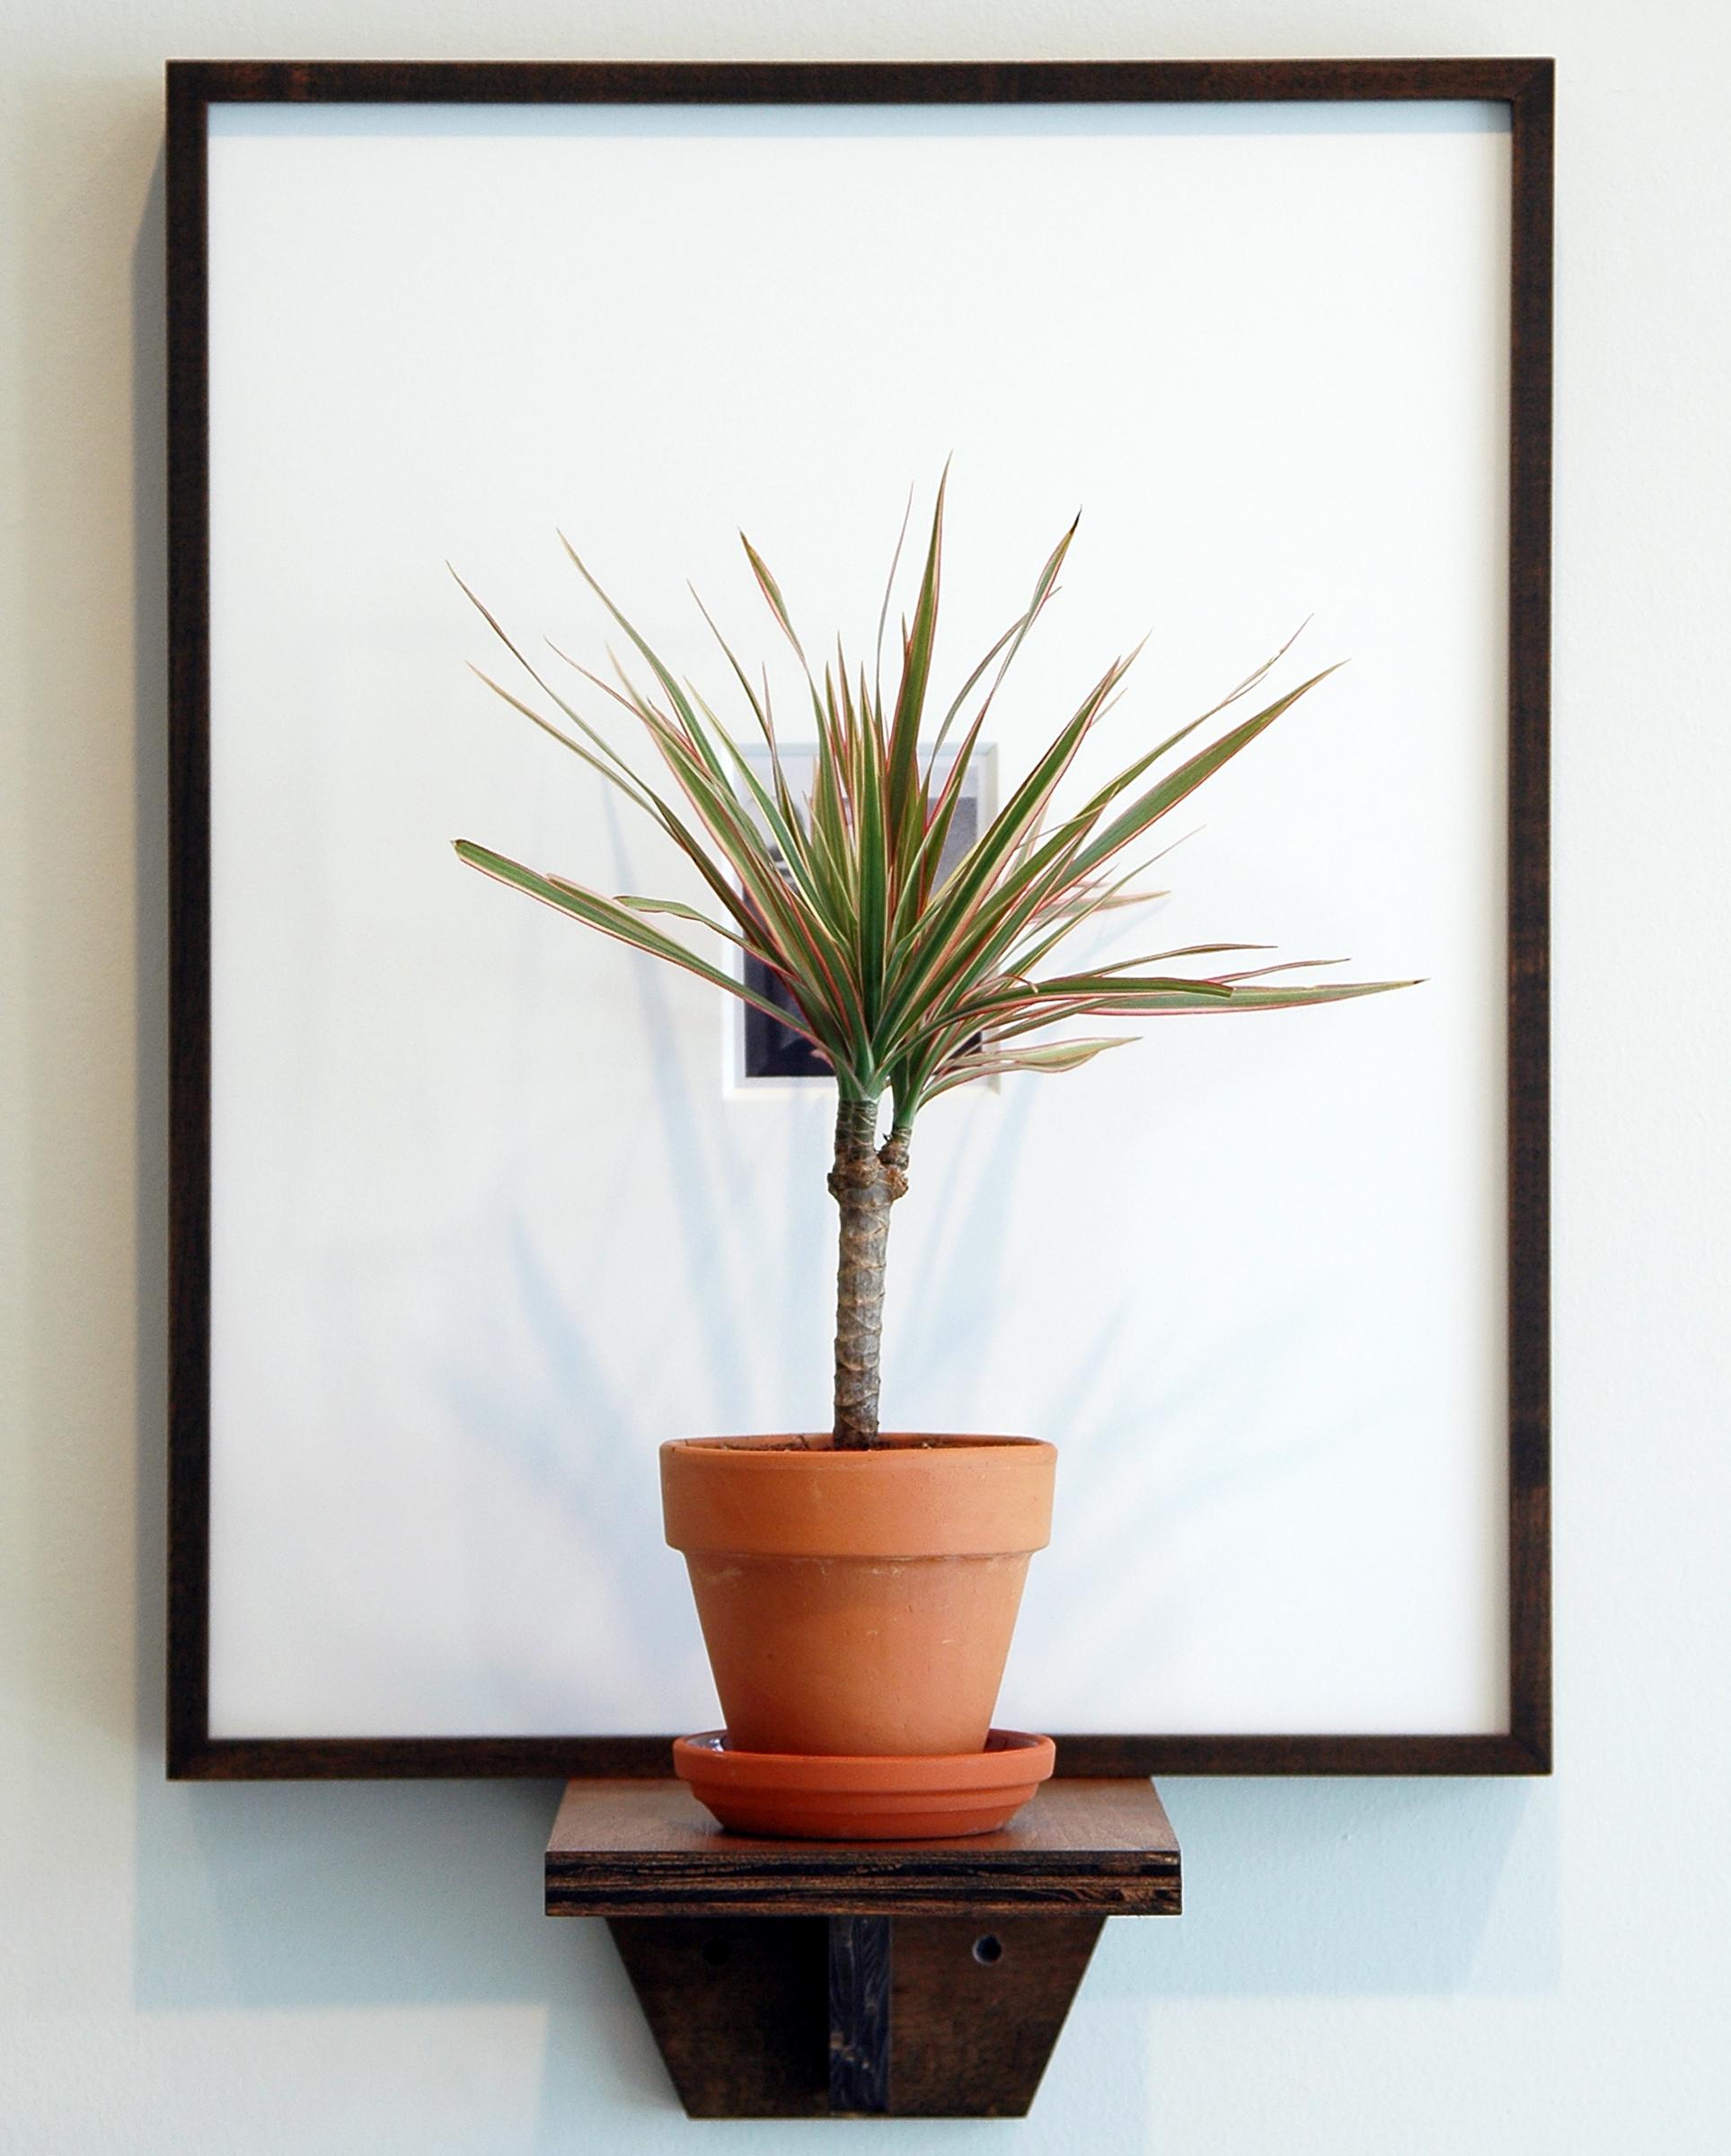 "JOSHUA PIEPER   Dead and Alive (Harry) , framed archival Polaroid, shelf, tri-colored dresena plant, 24.5"" x 16.25"" x 9.75"", 2012"